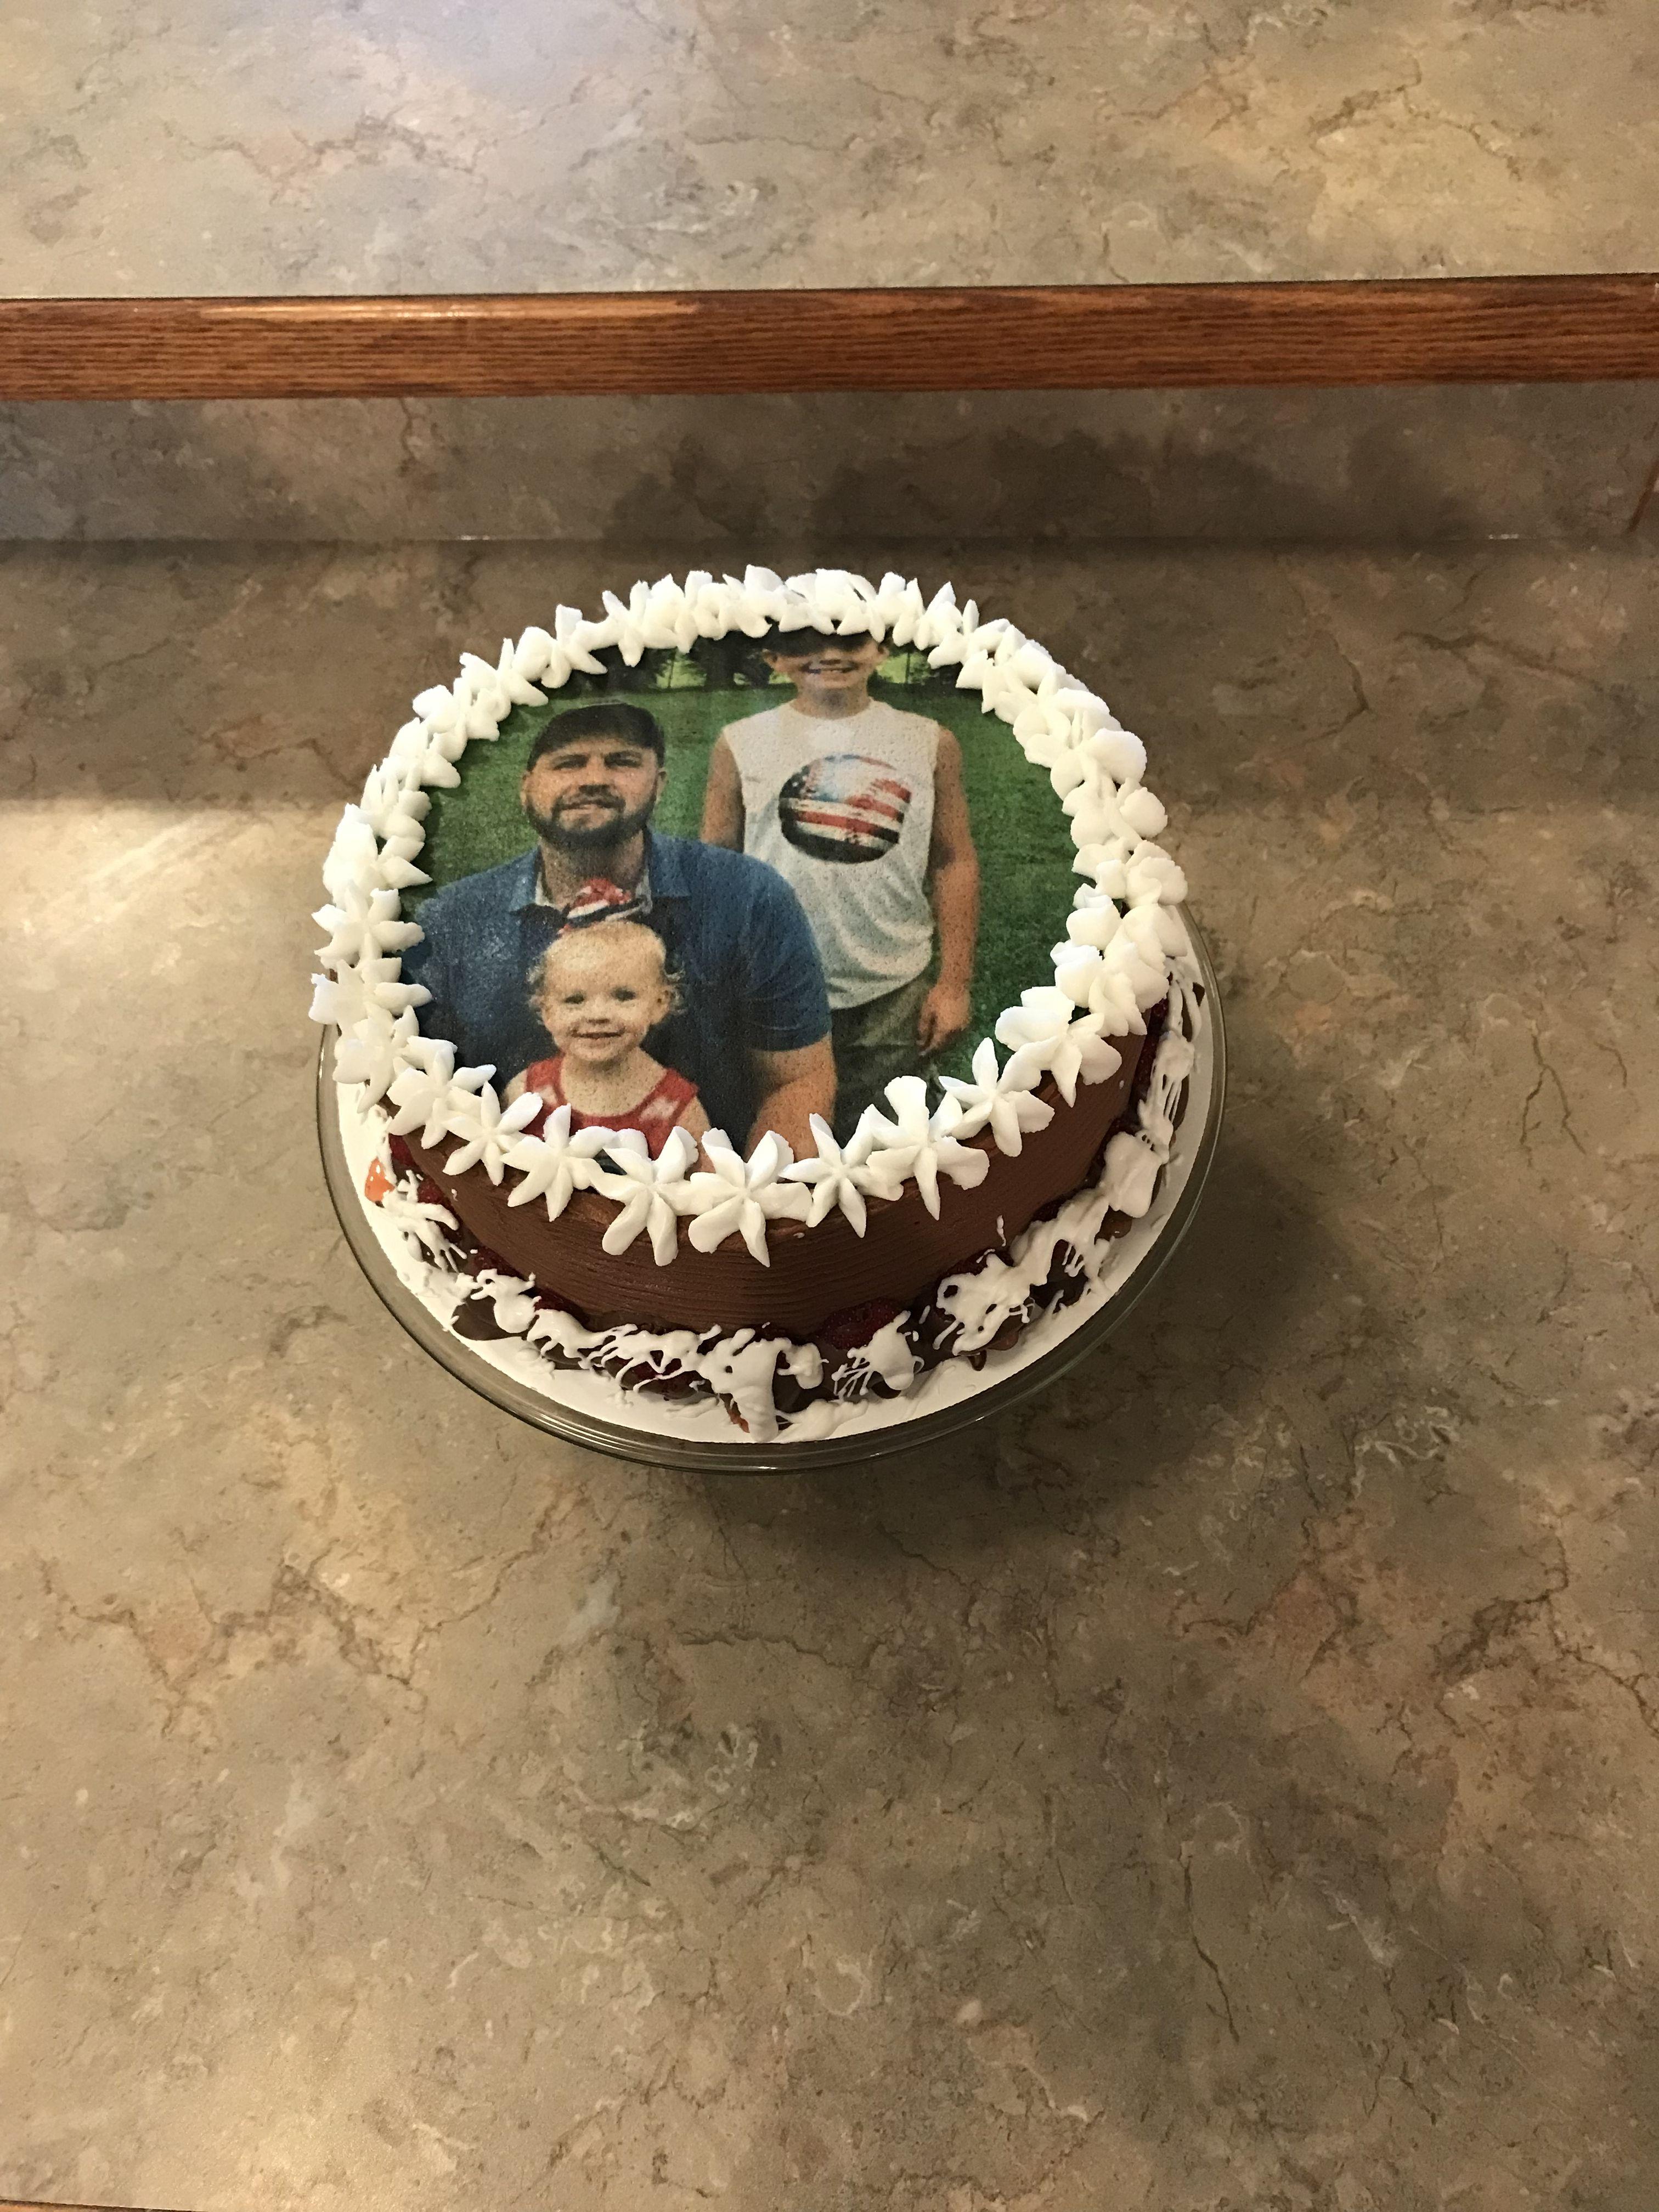 Edible image edible images cake custom cakes